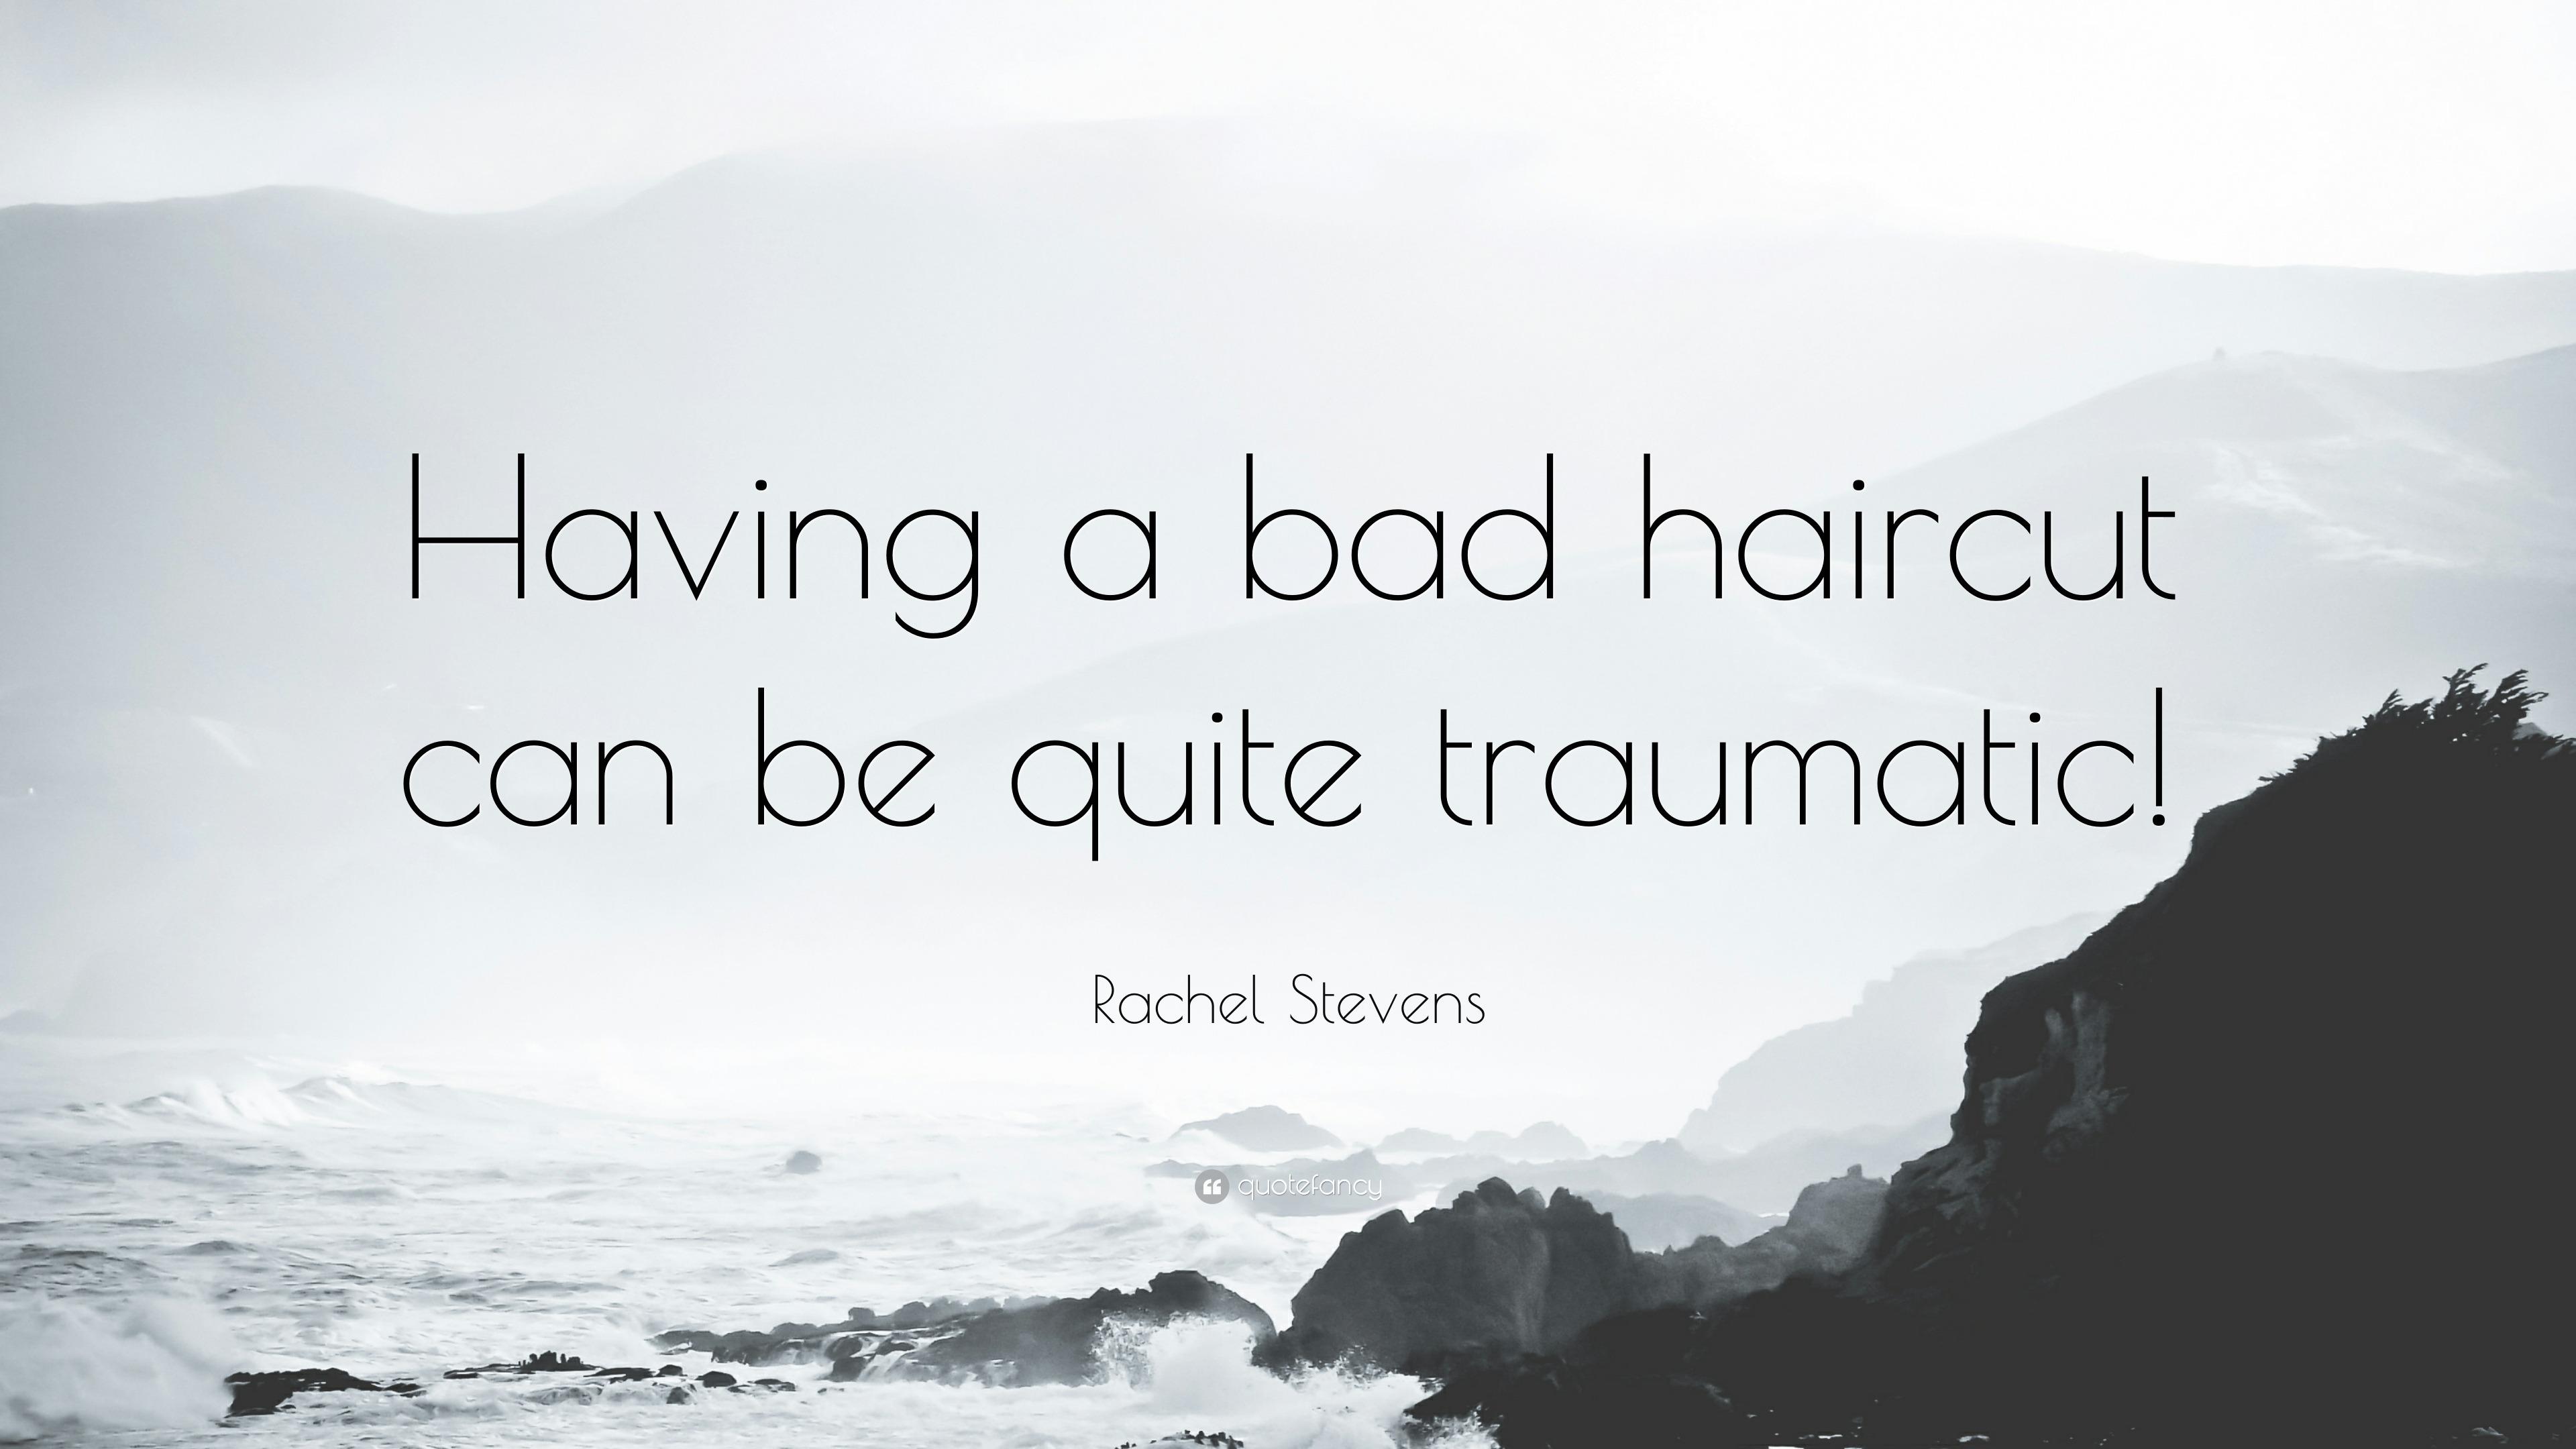 Rachel Stevens Quote Having A Bad Haircut Can Be Quite Traumatic